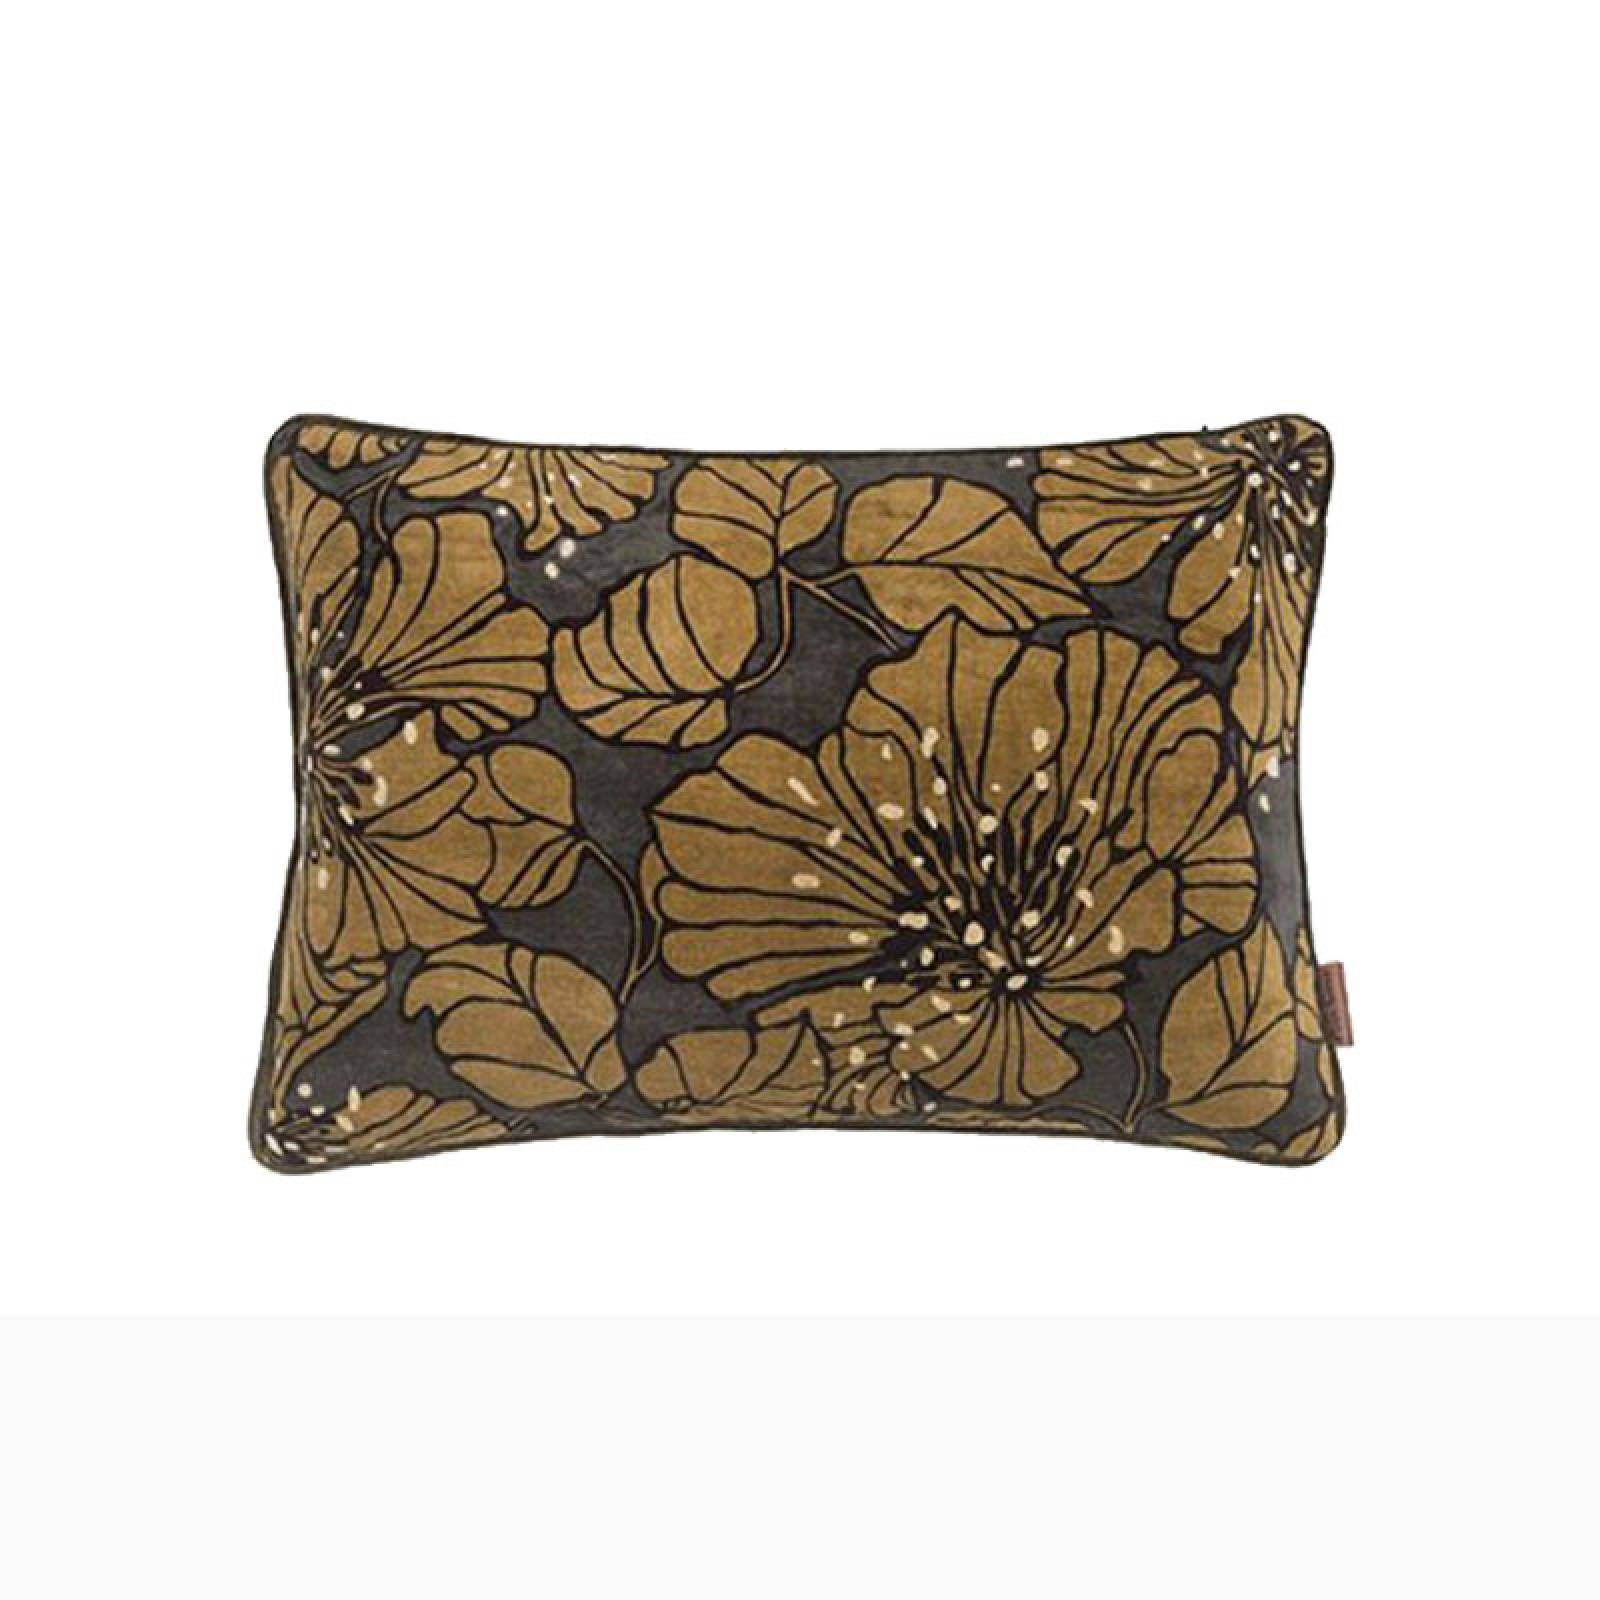 Rectangular Dahlia Velvet Cushion In Army thumbnails